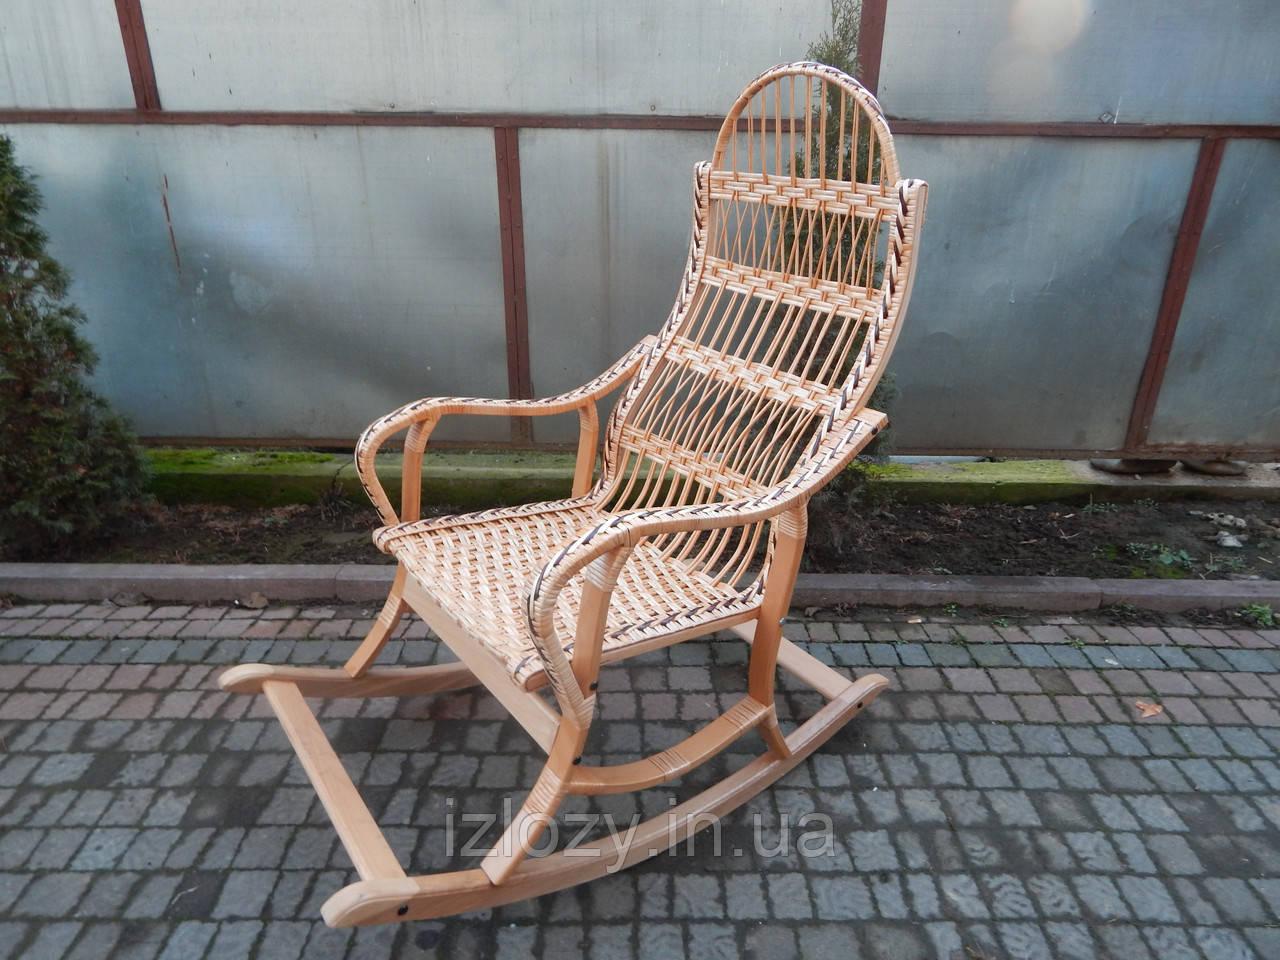 Плетеное кресло-качалка розборное, фото 1